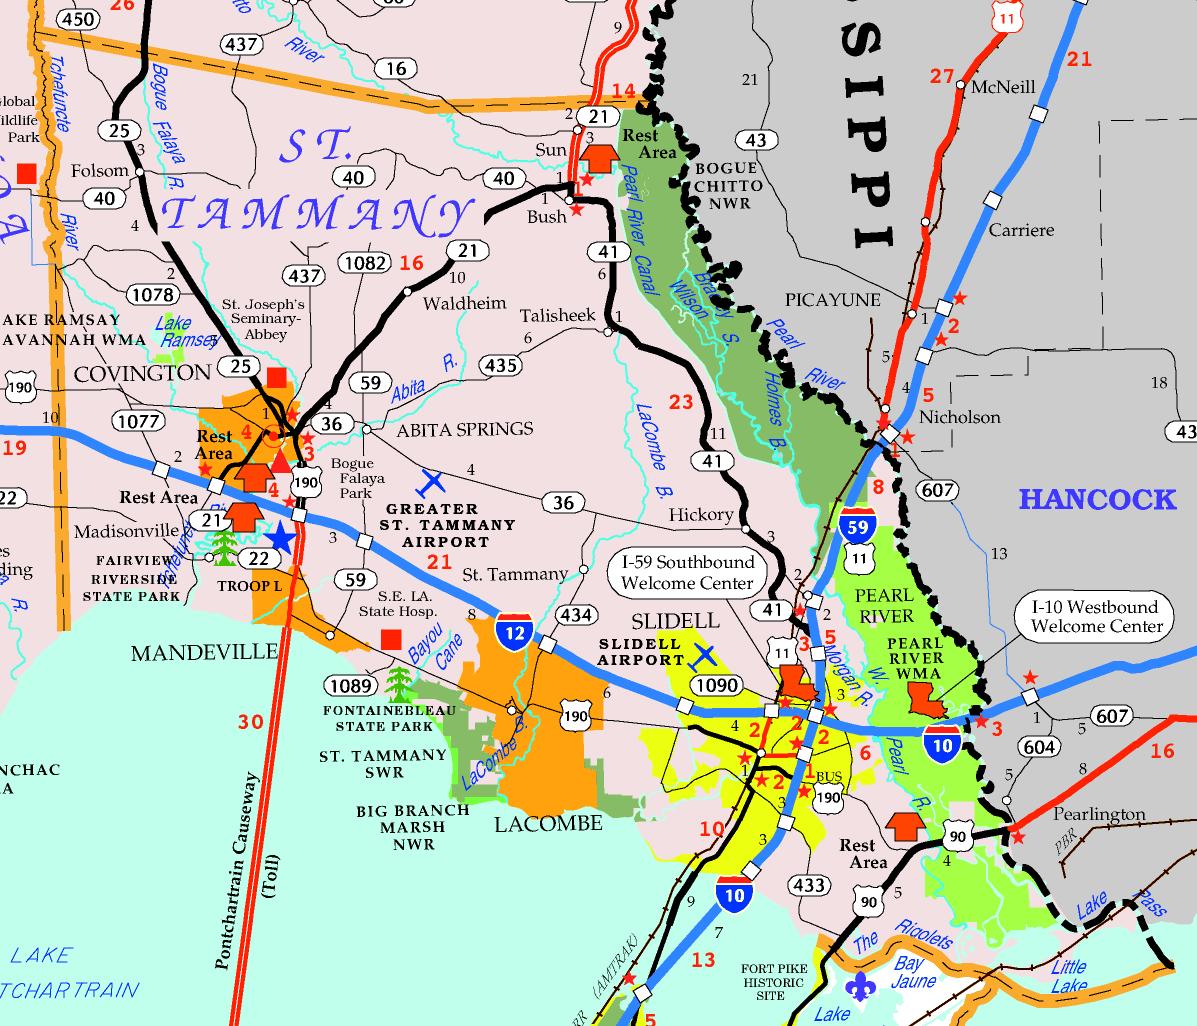 DOTD Tourism Map of St. Tammany Parish